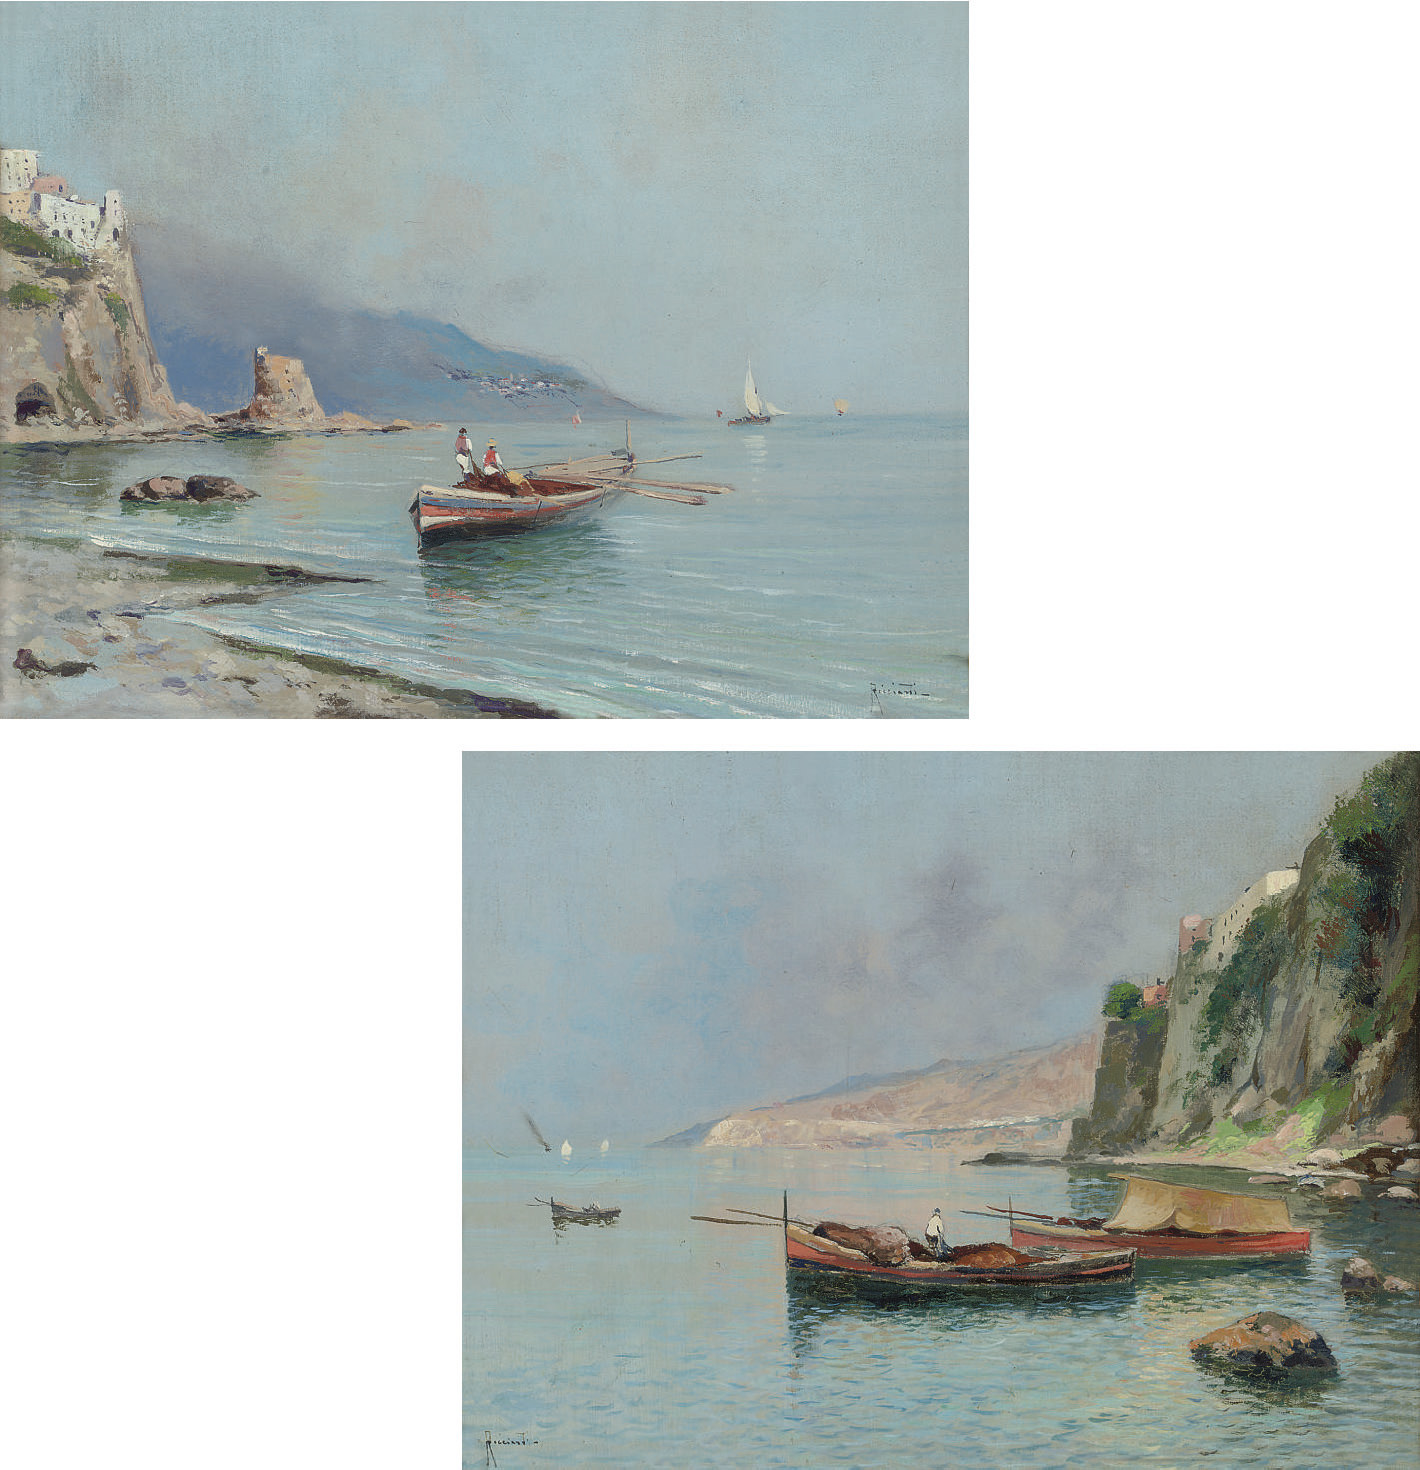 Fishing boats on Neapolitan coast, a pair